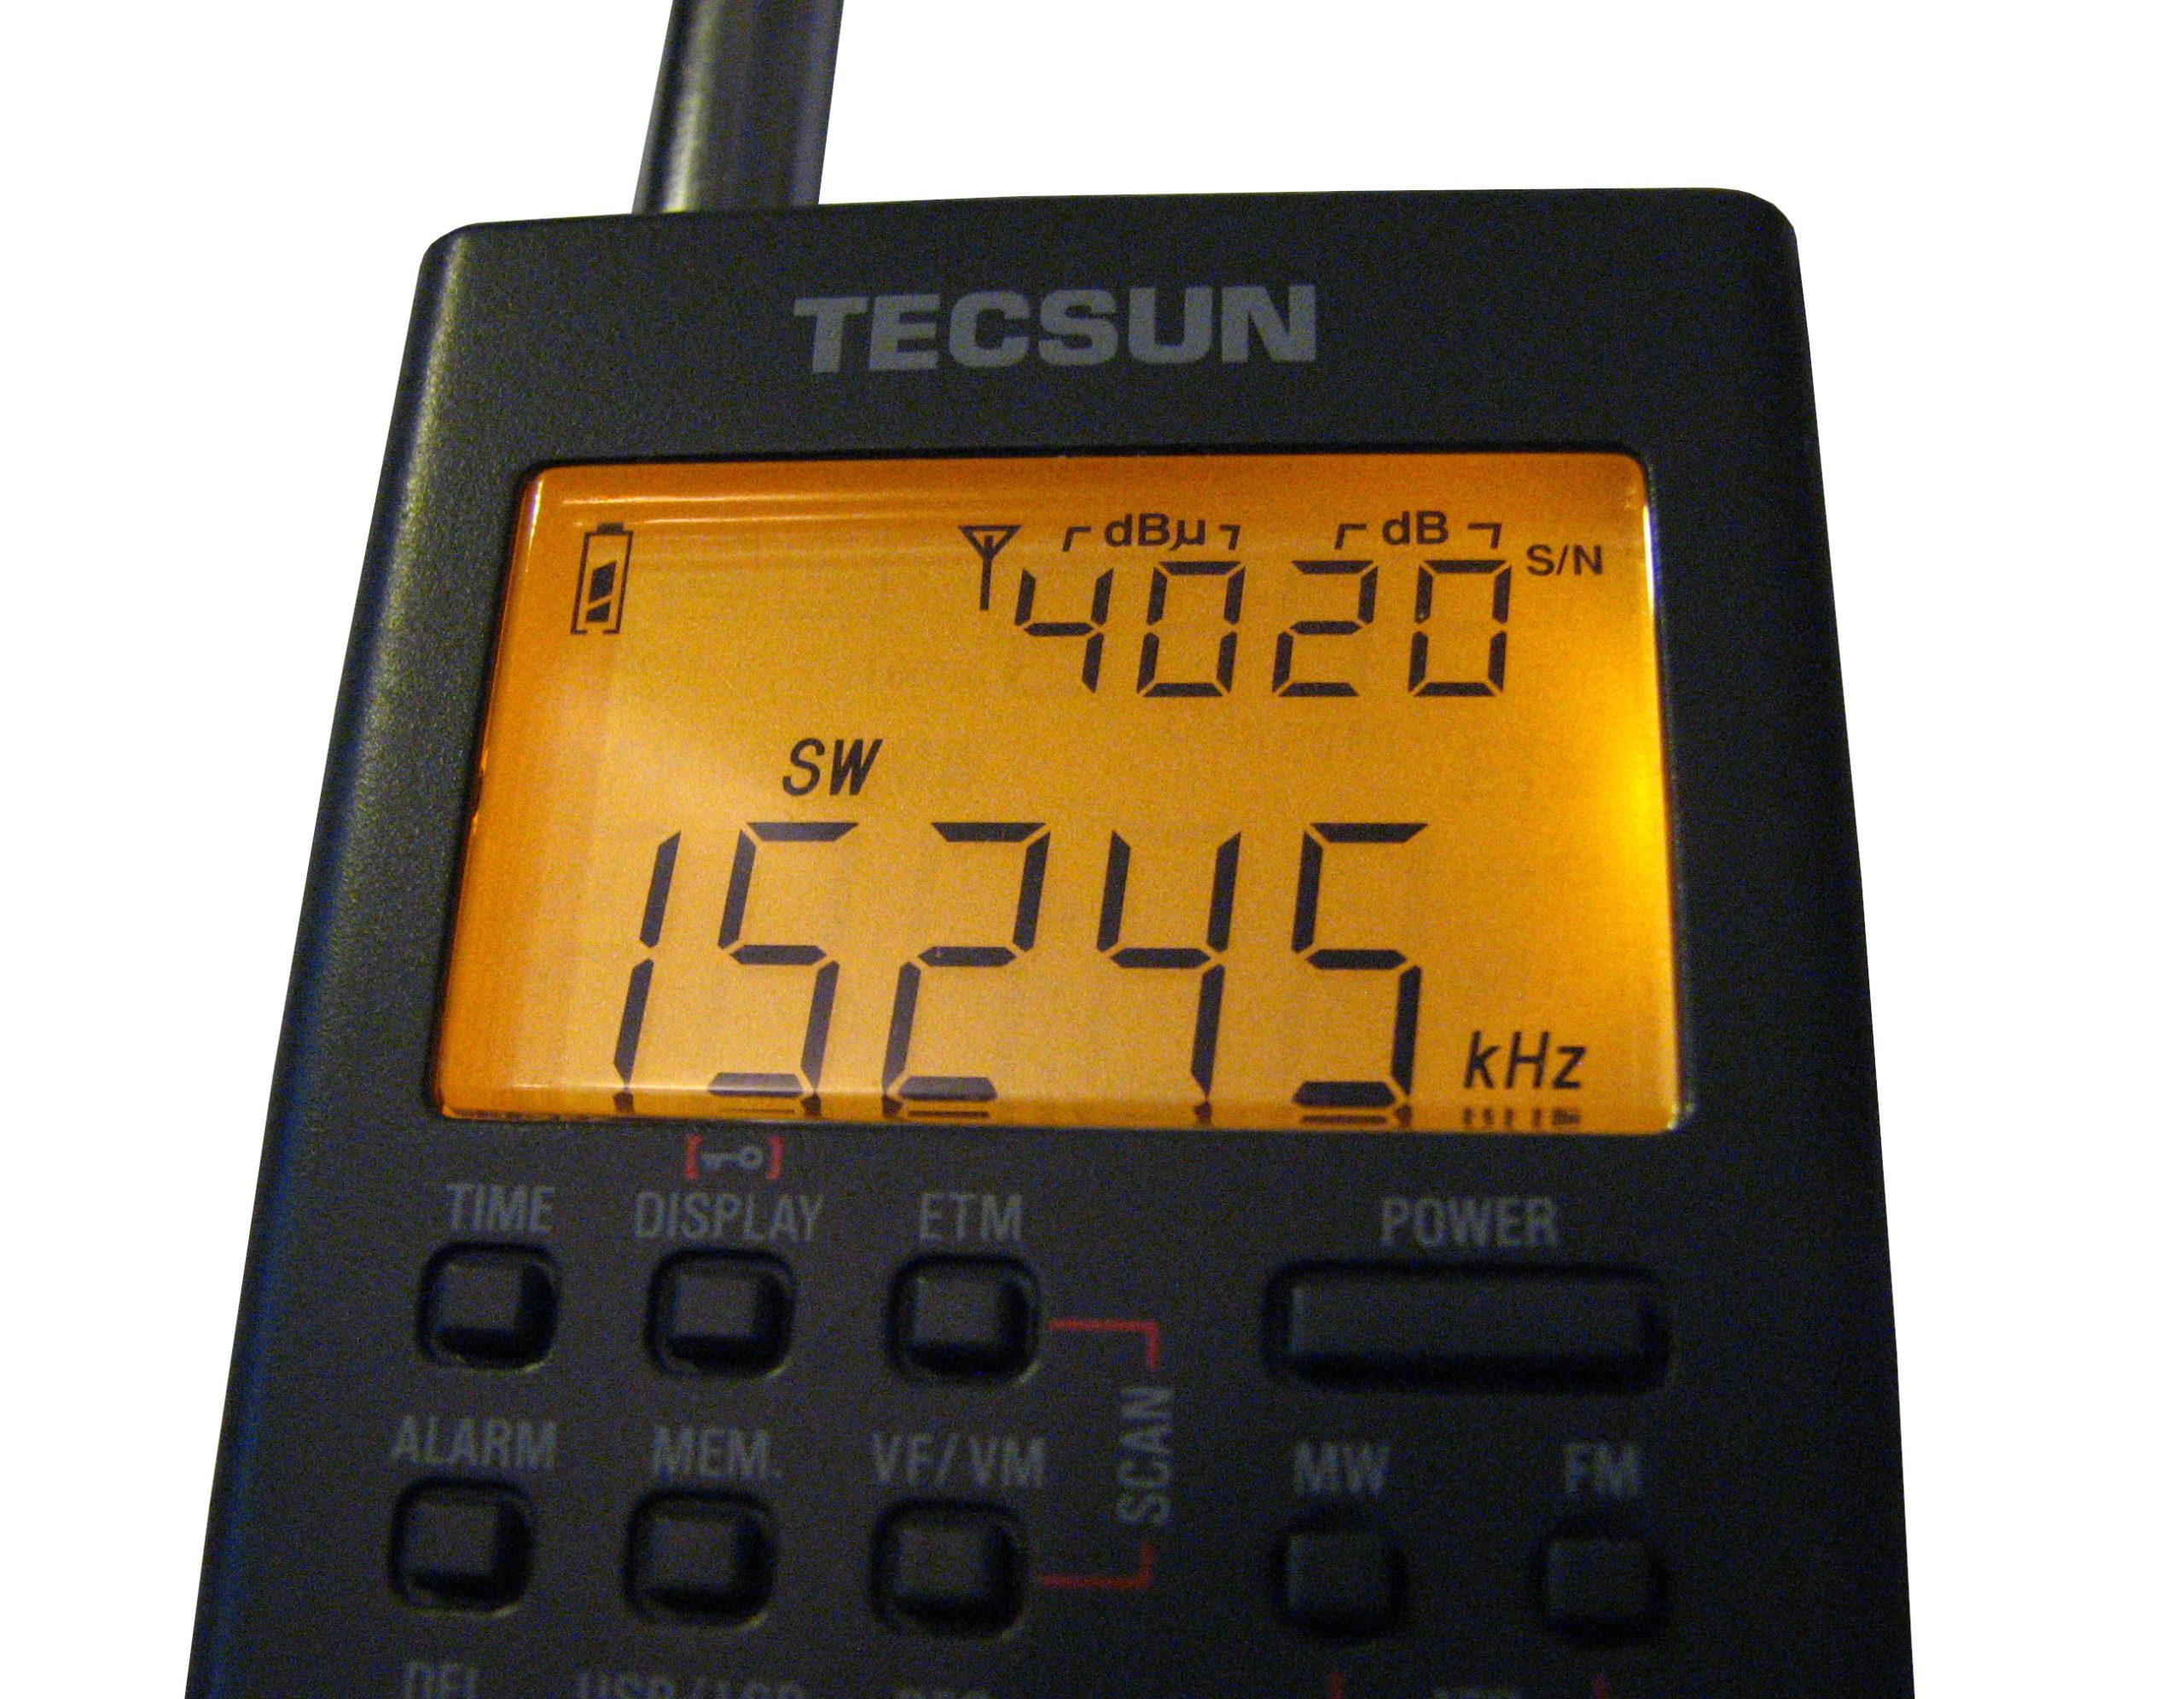 Tecsun PL-365 display